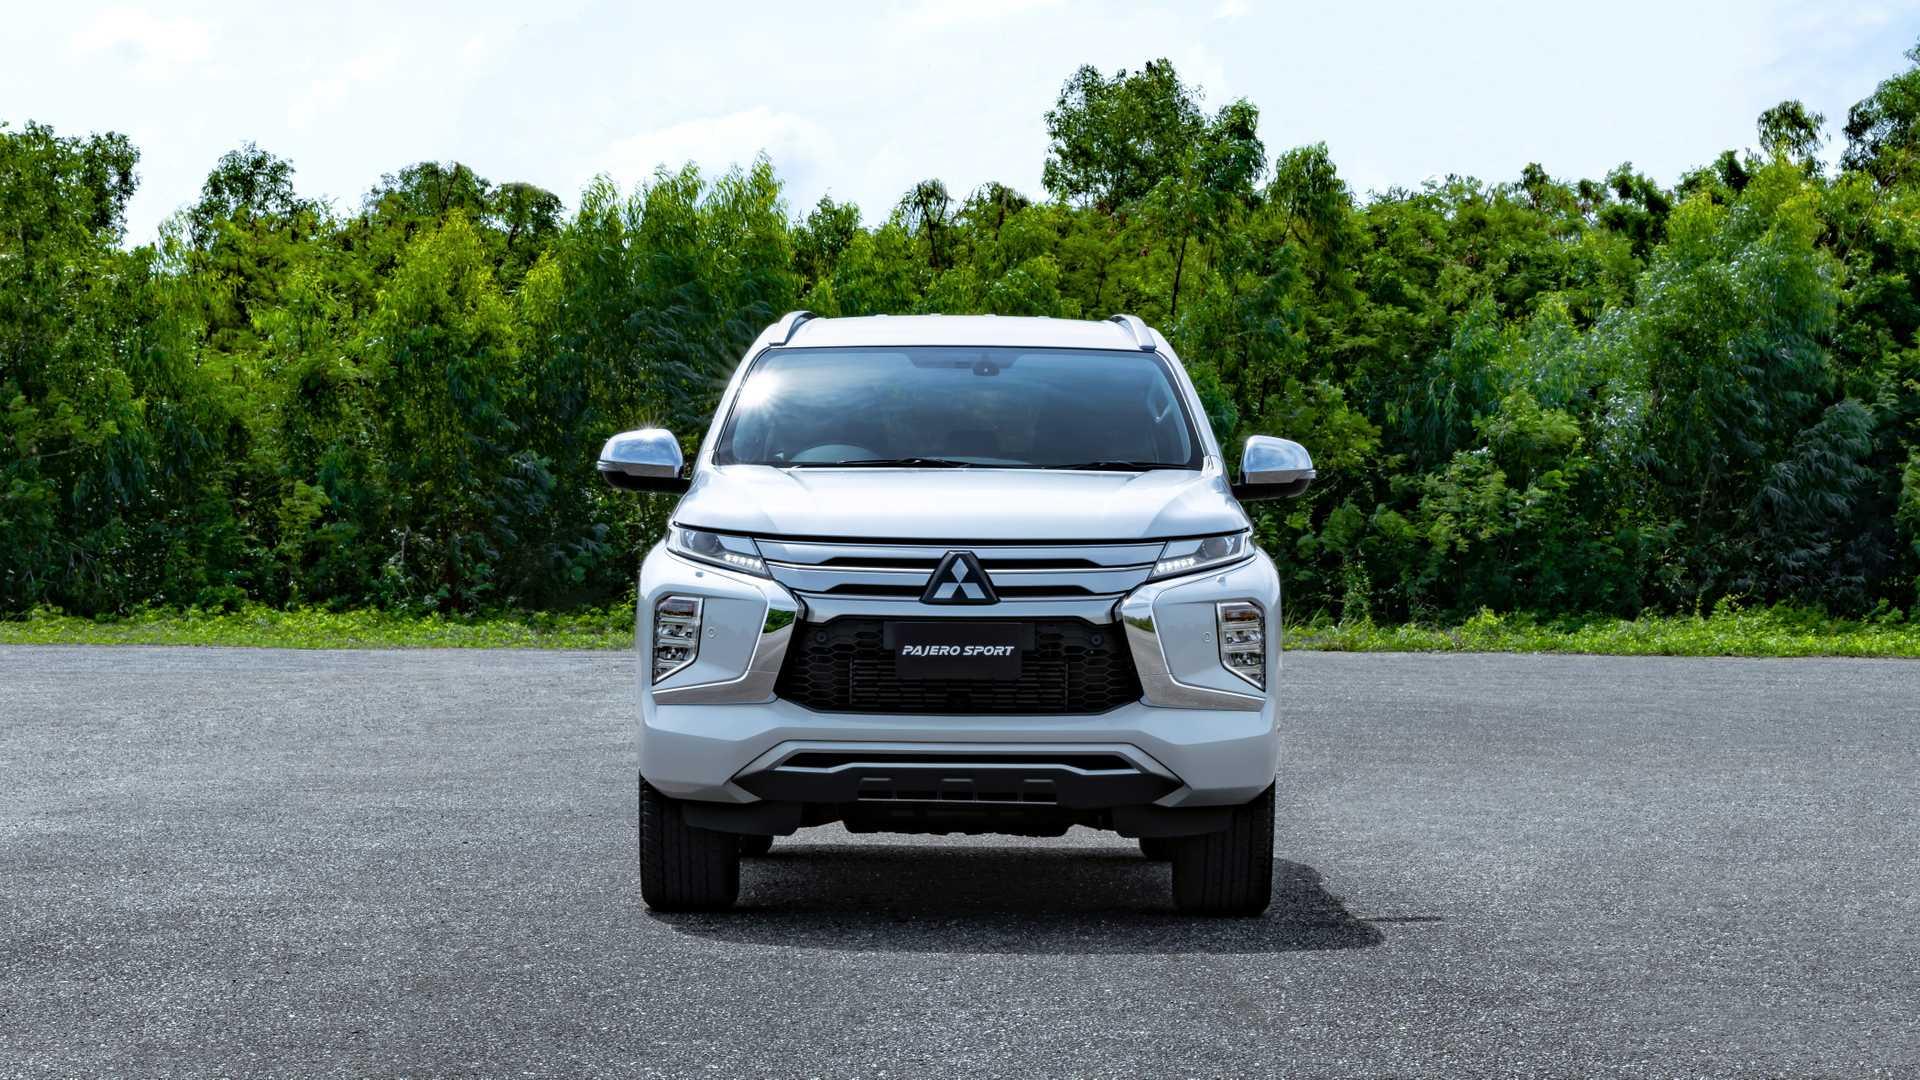 2020_Mitsubishi_Pajero_Sport_facelift_0002